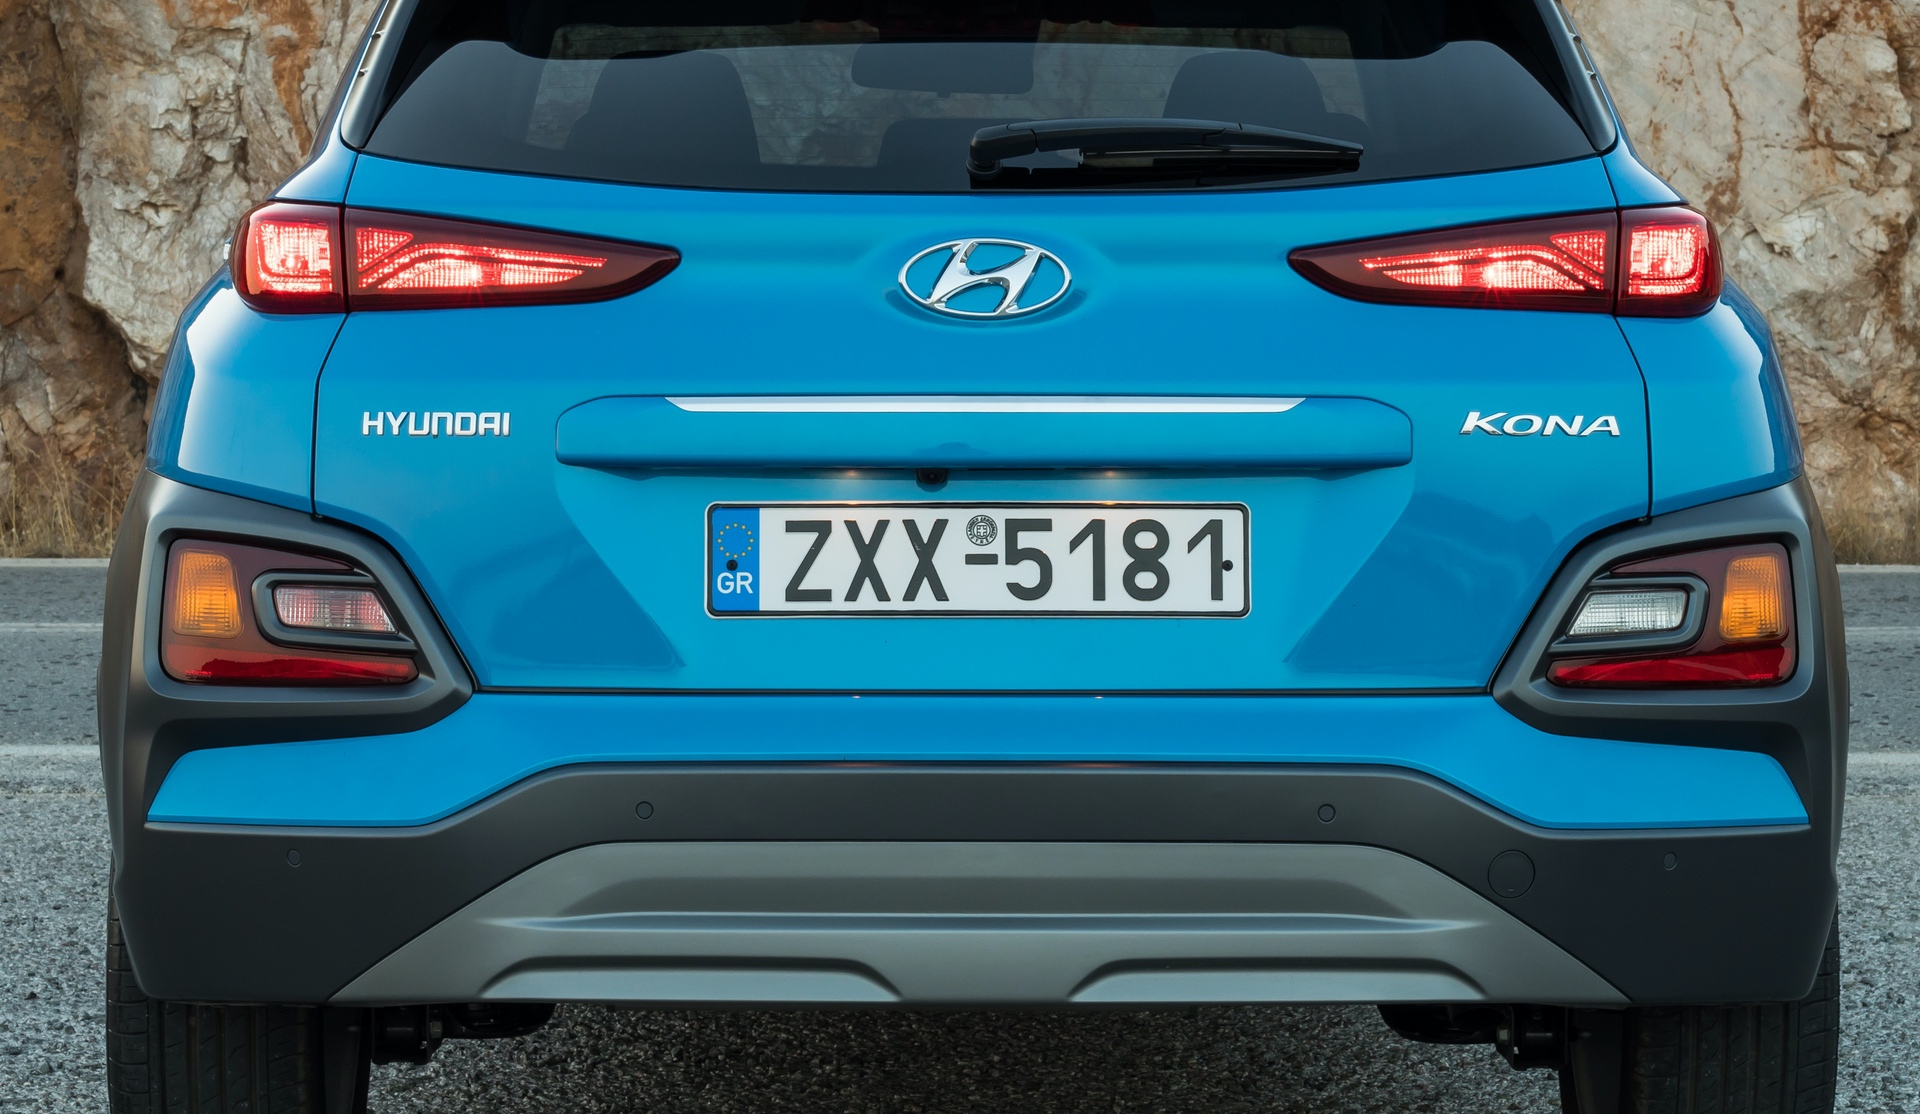 Hyundai_Kona_greek_presskit_0082